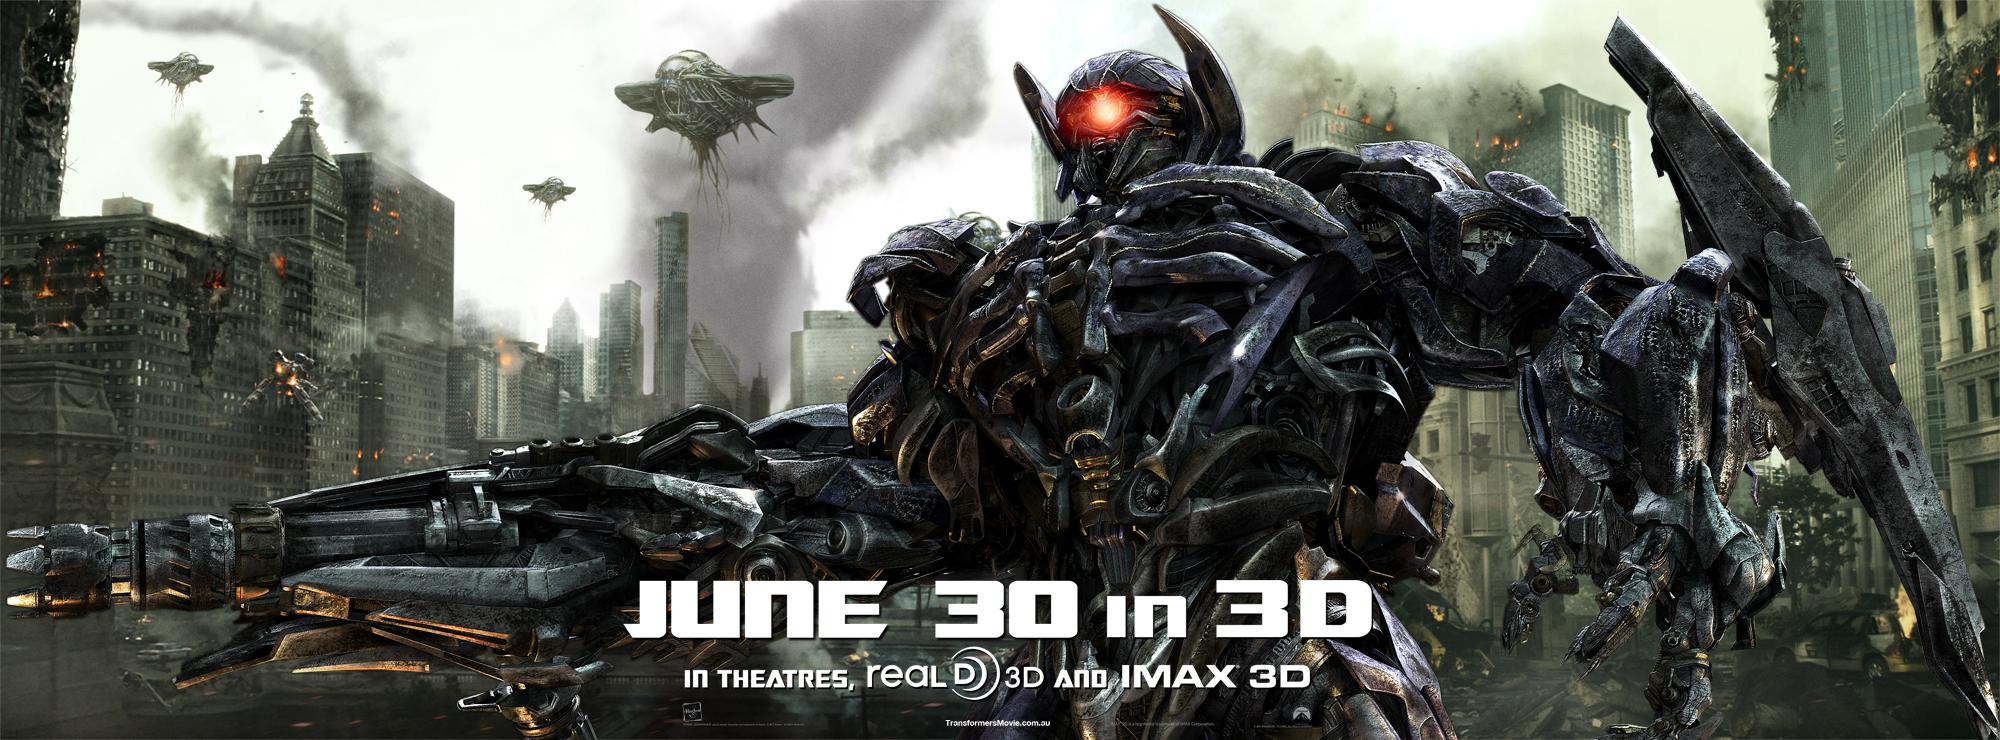 Transformers: Dark of the Moon - Shockwave Banner